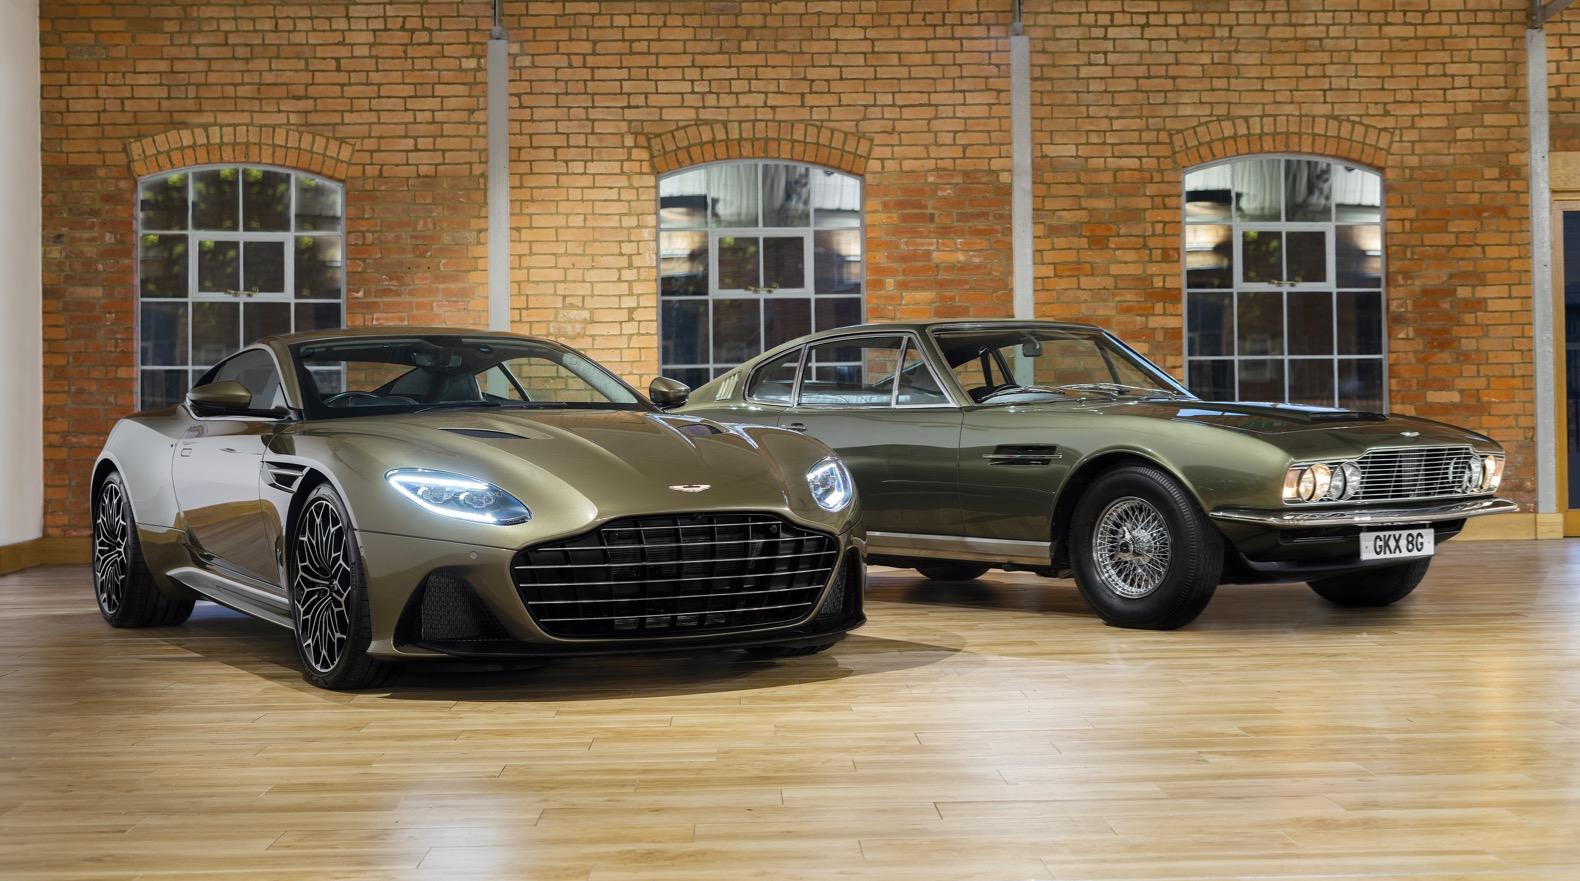 Aston Martin Dbs Superleggera Celebrates James Bond The Torque Report